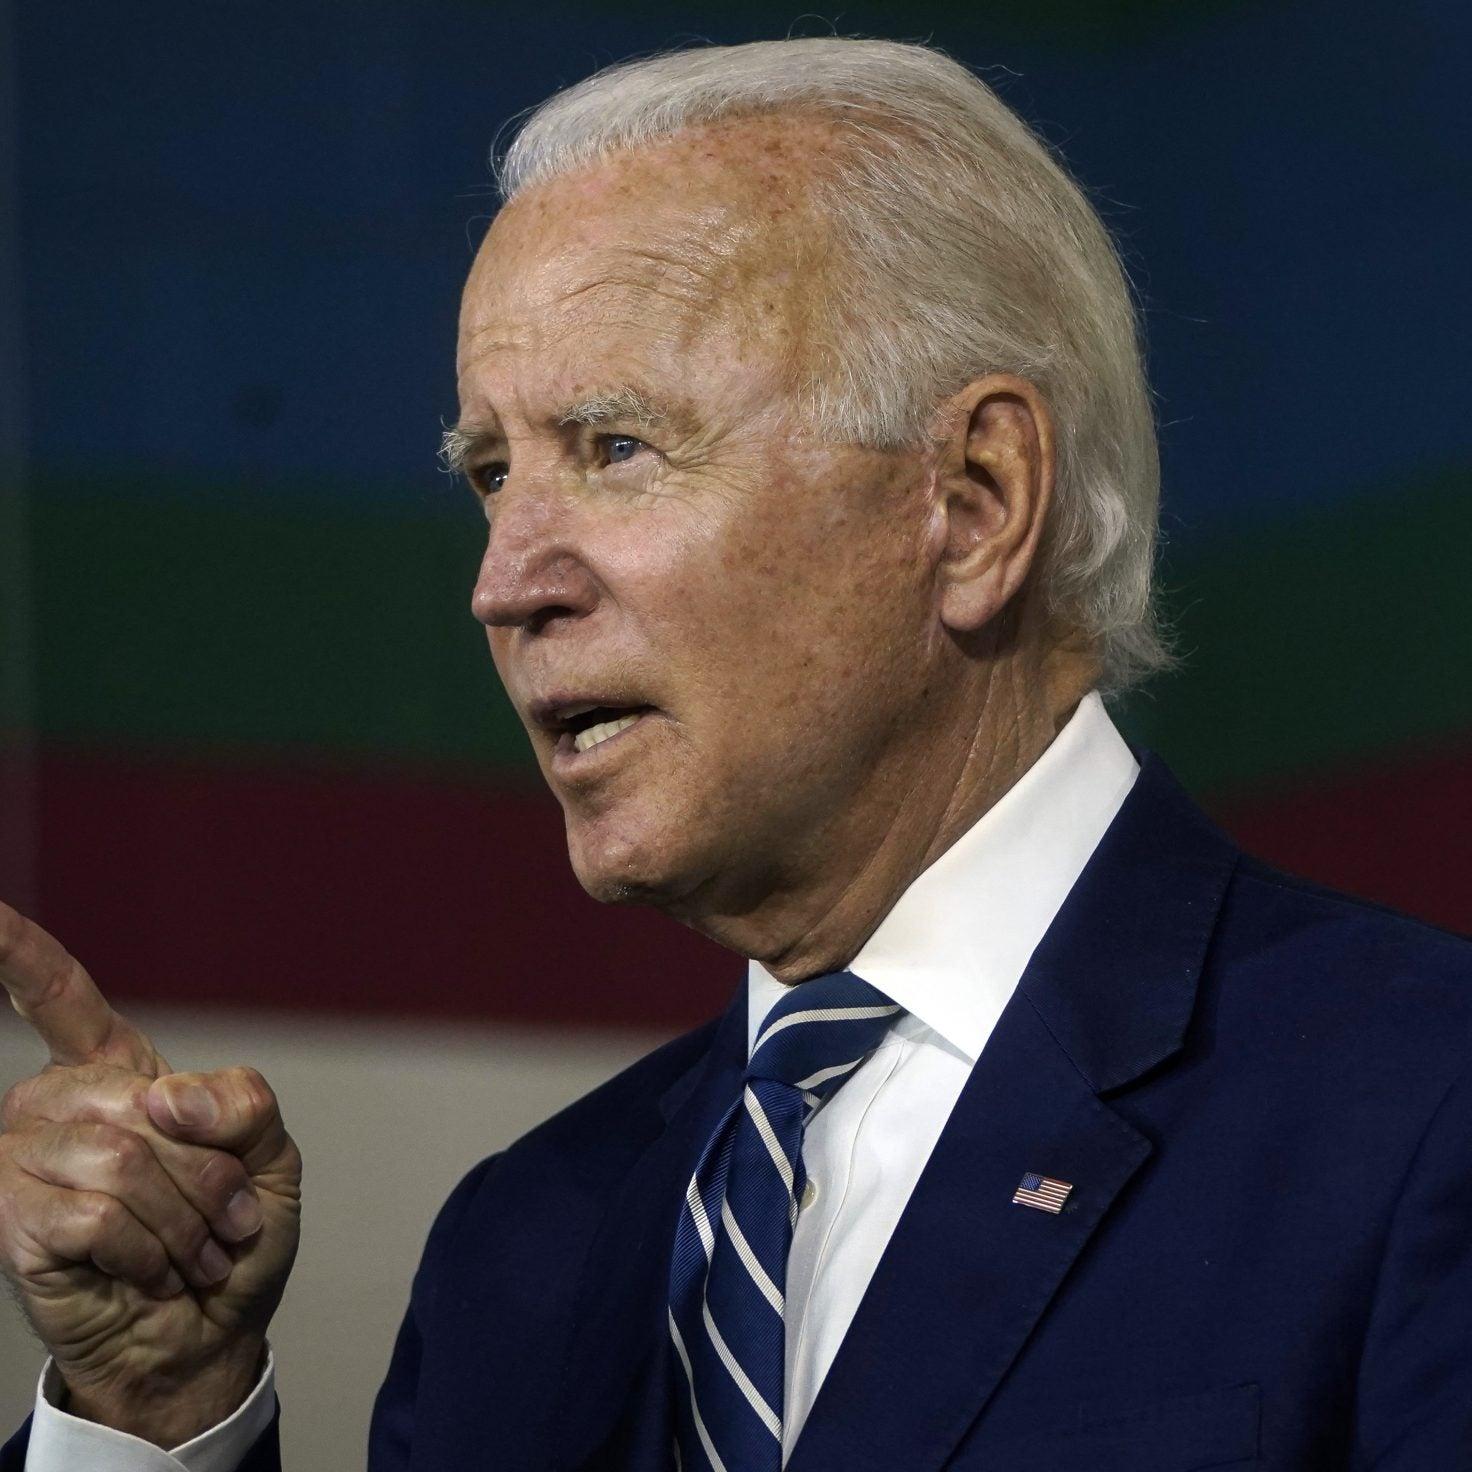 Joe Biden Says Trump Is The 'First' Racist President